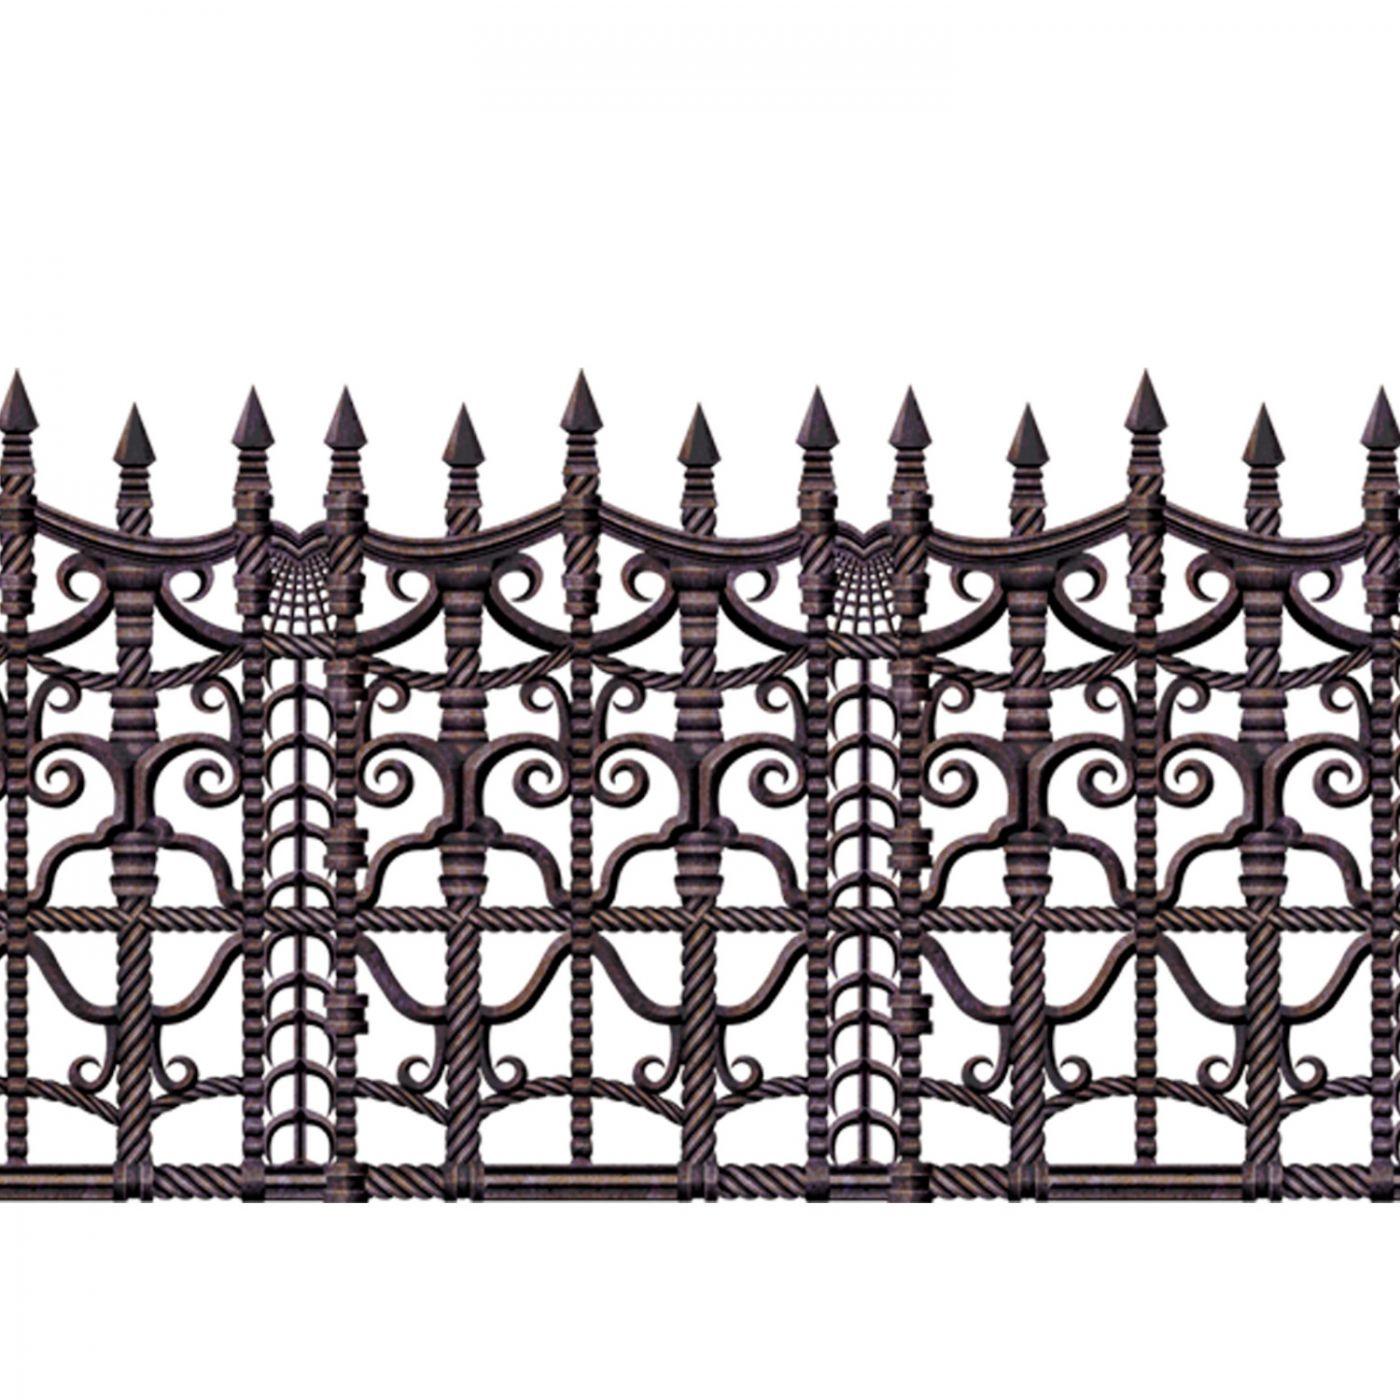 Creepy Fence Border (6) image